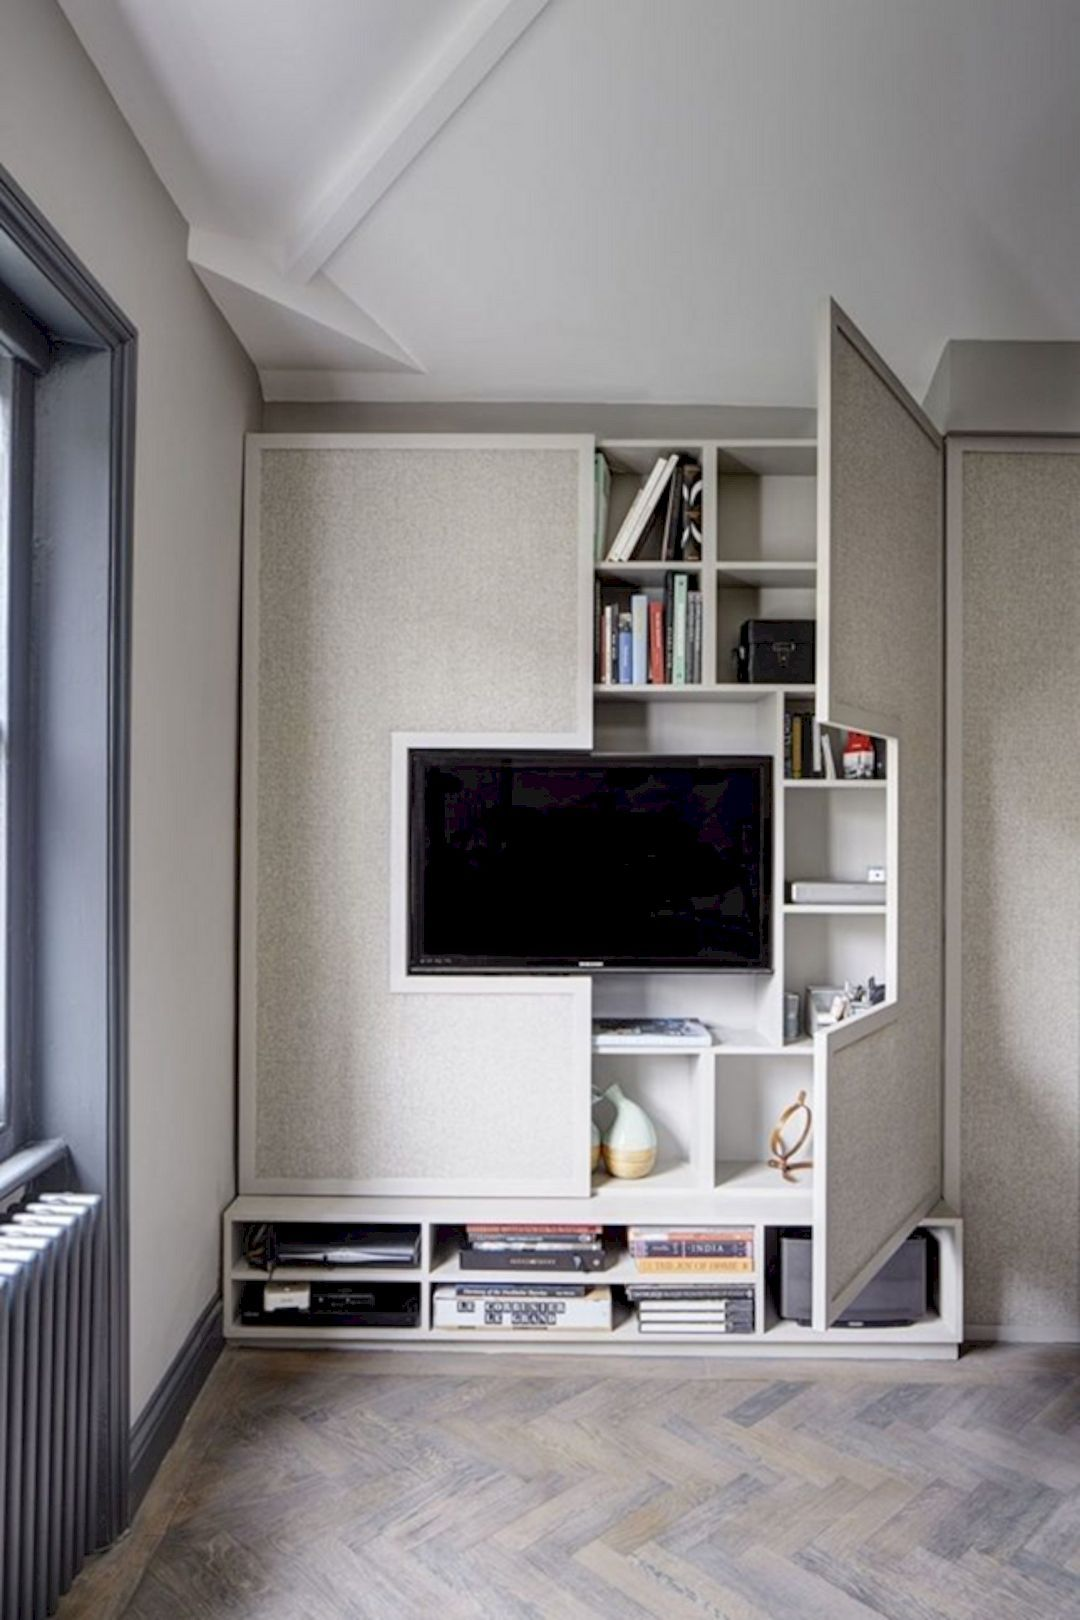 pin by futurist architecture on furniture design ideas in 2019 rh pinterest com